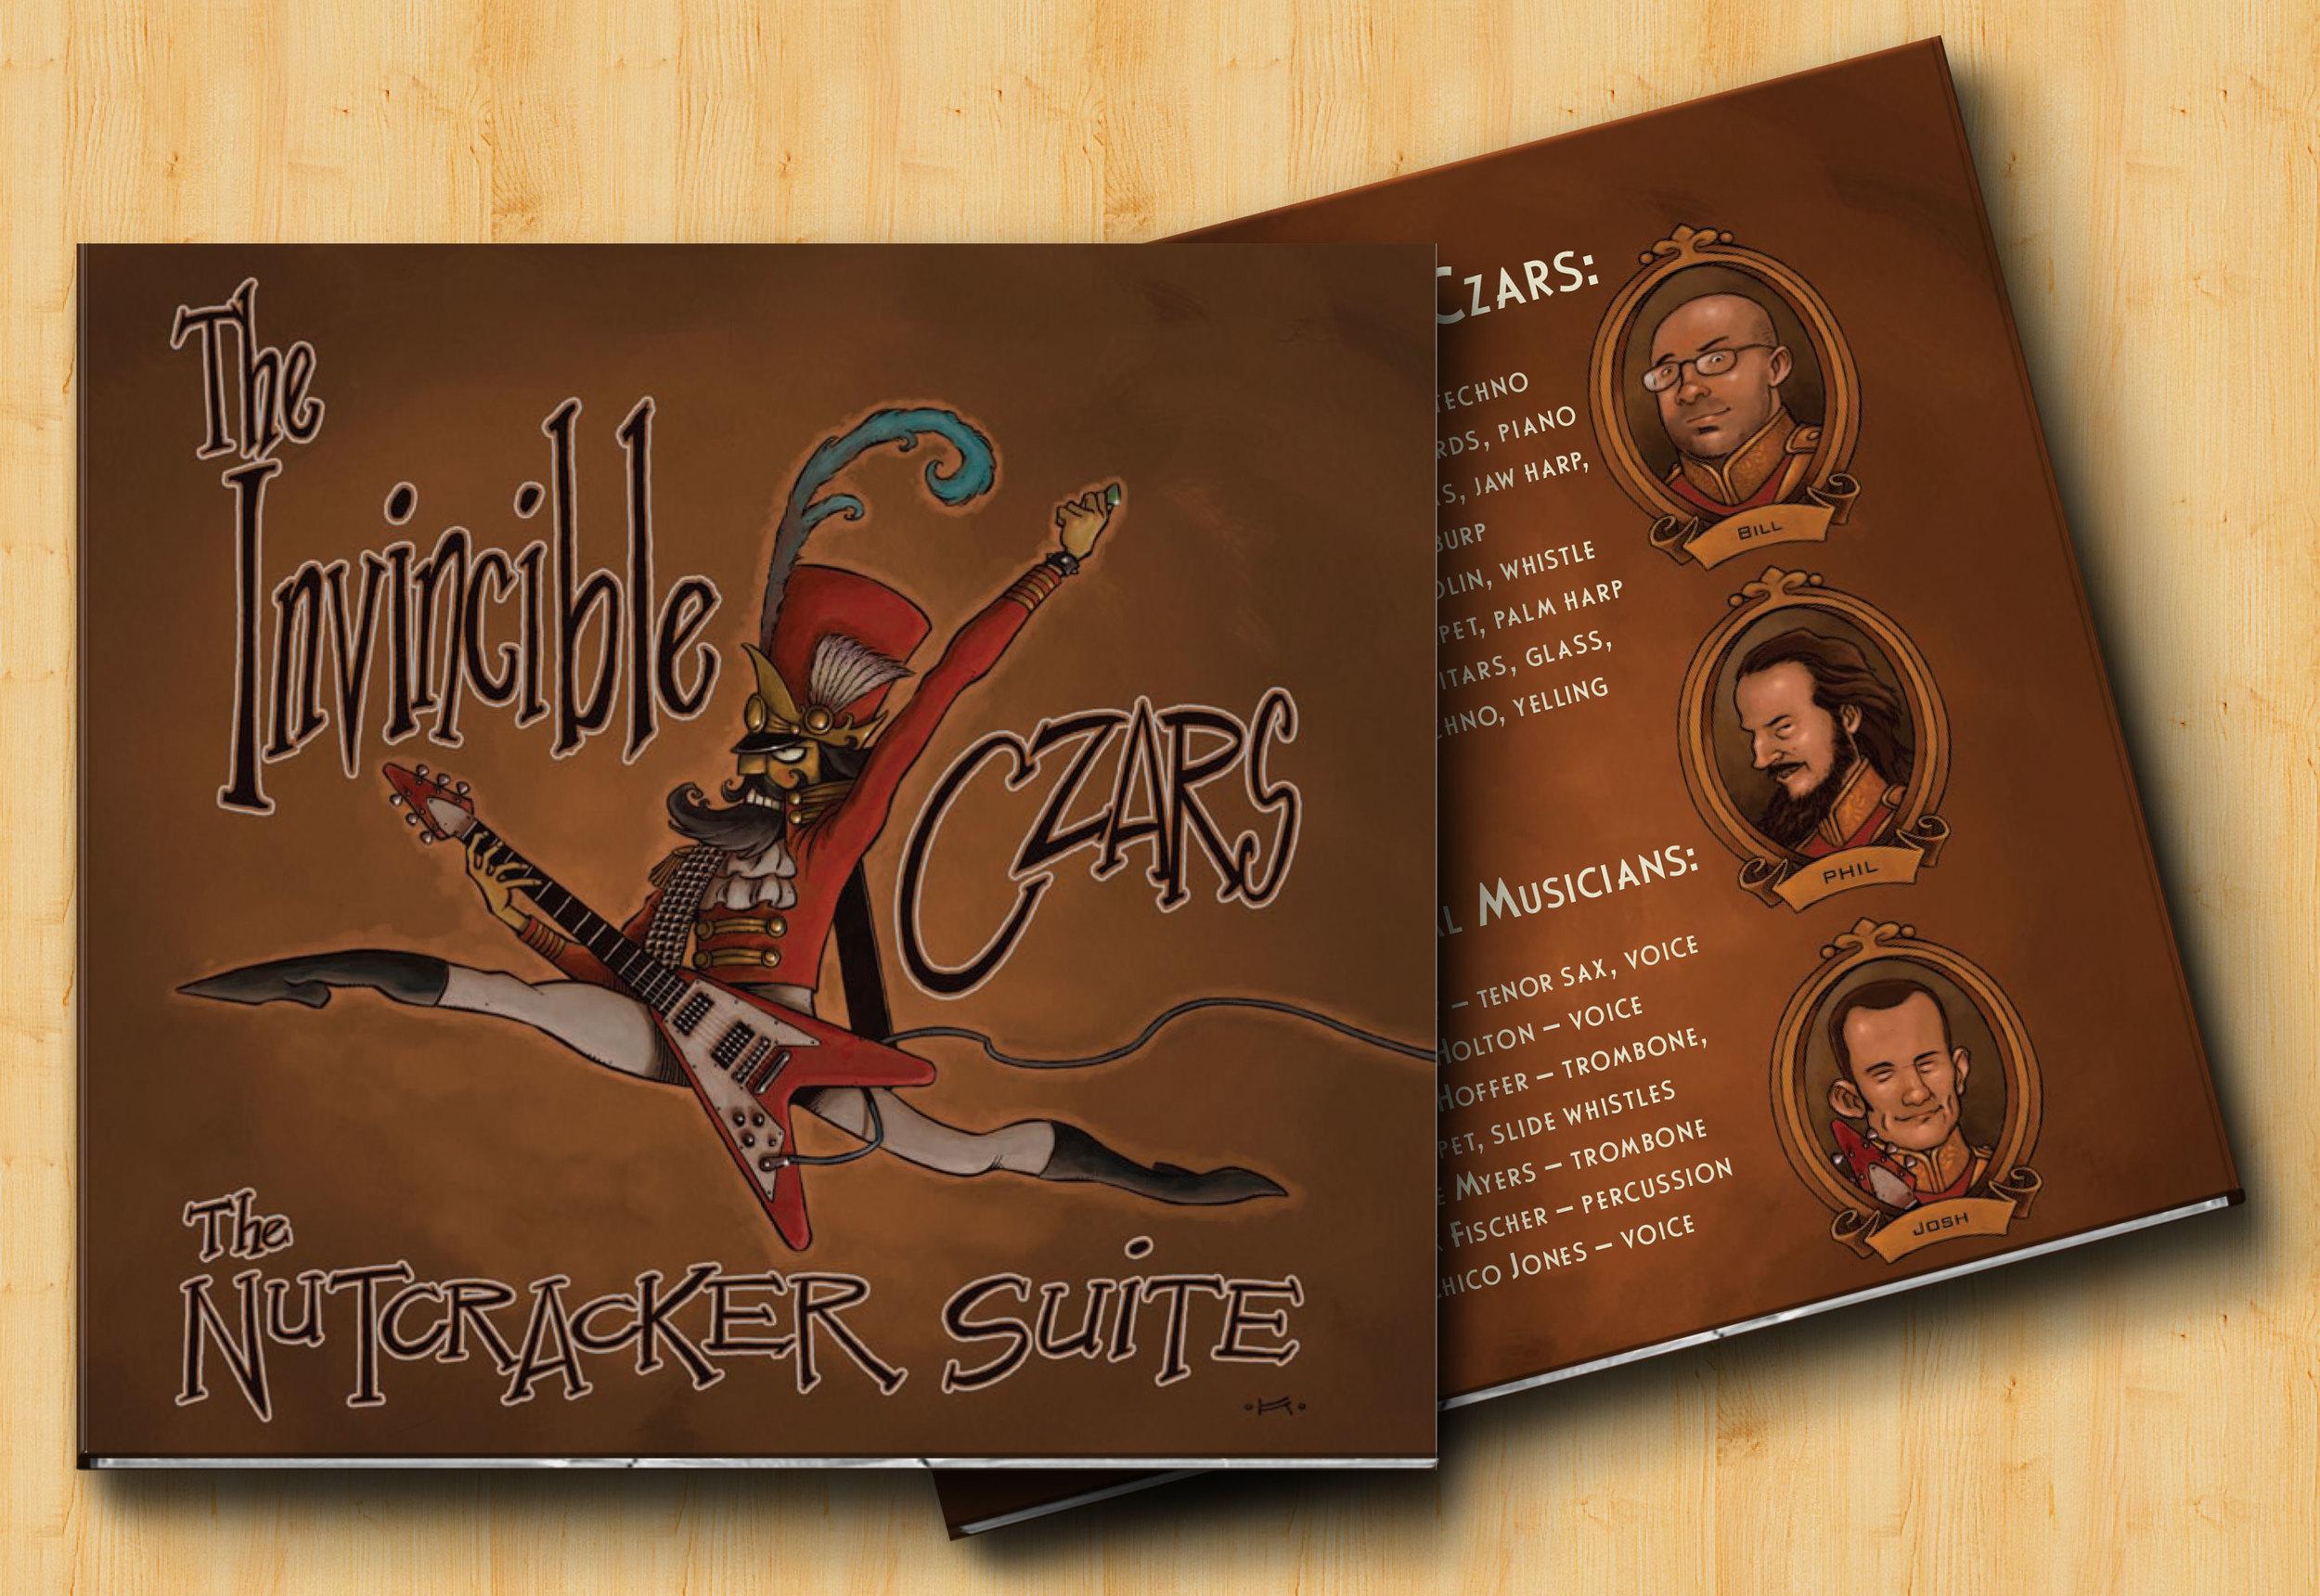 The Invincible Czars, The Nutcracker Suite